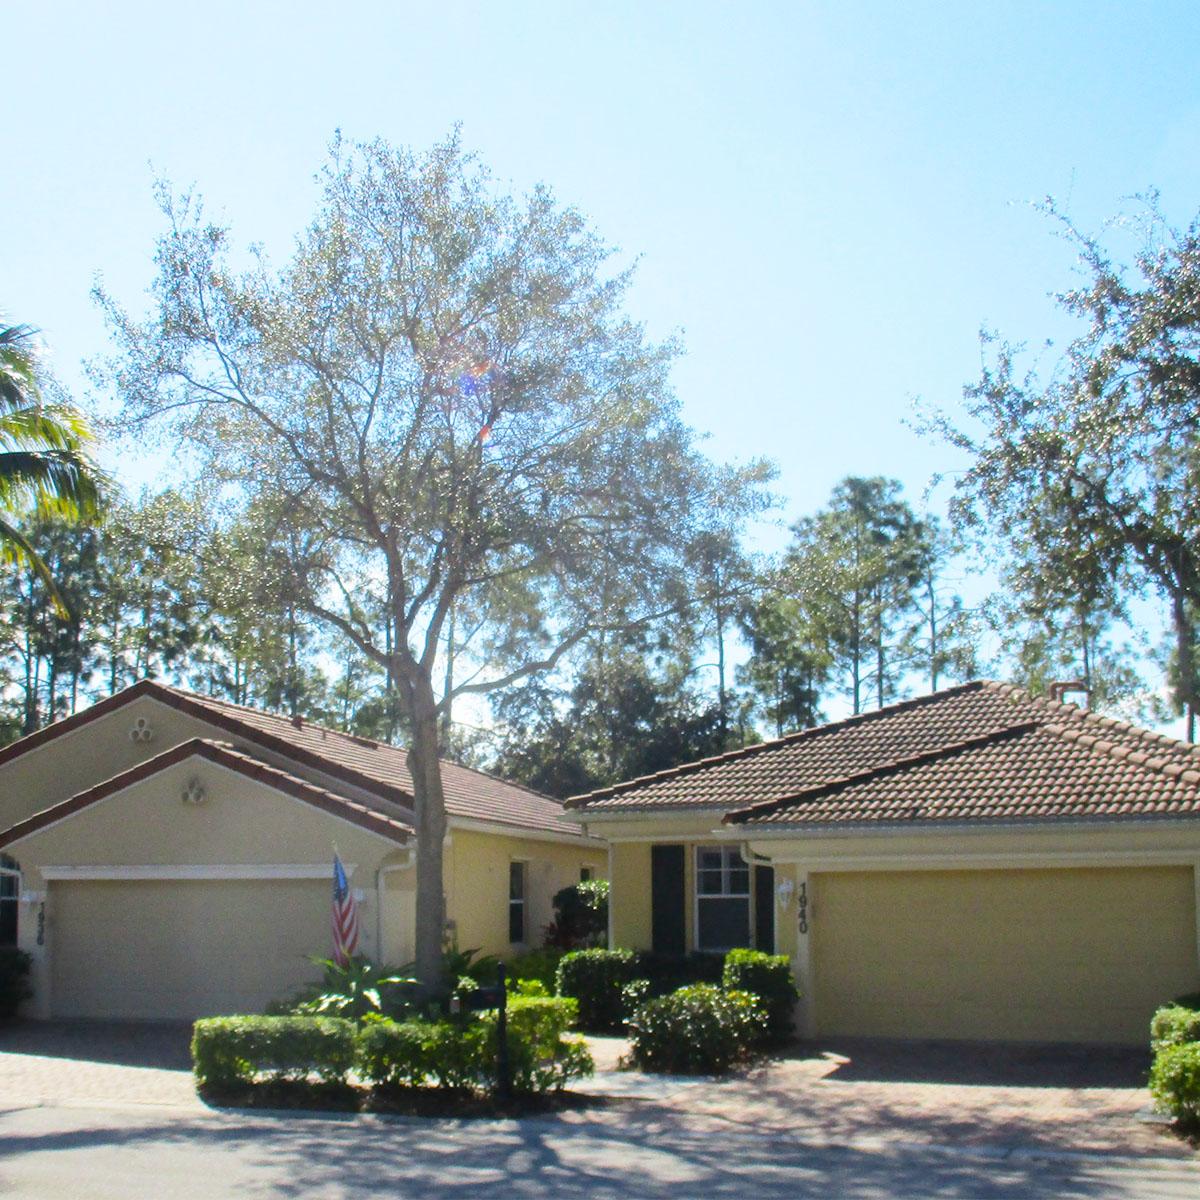 Leeward Bay | Tarpon Bay Community Association, Inc. - Naples, Florida